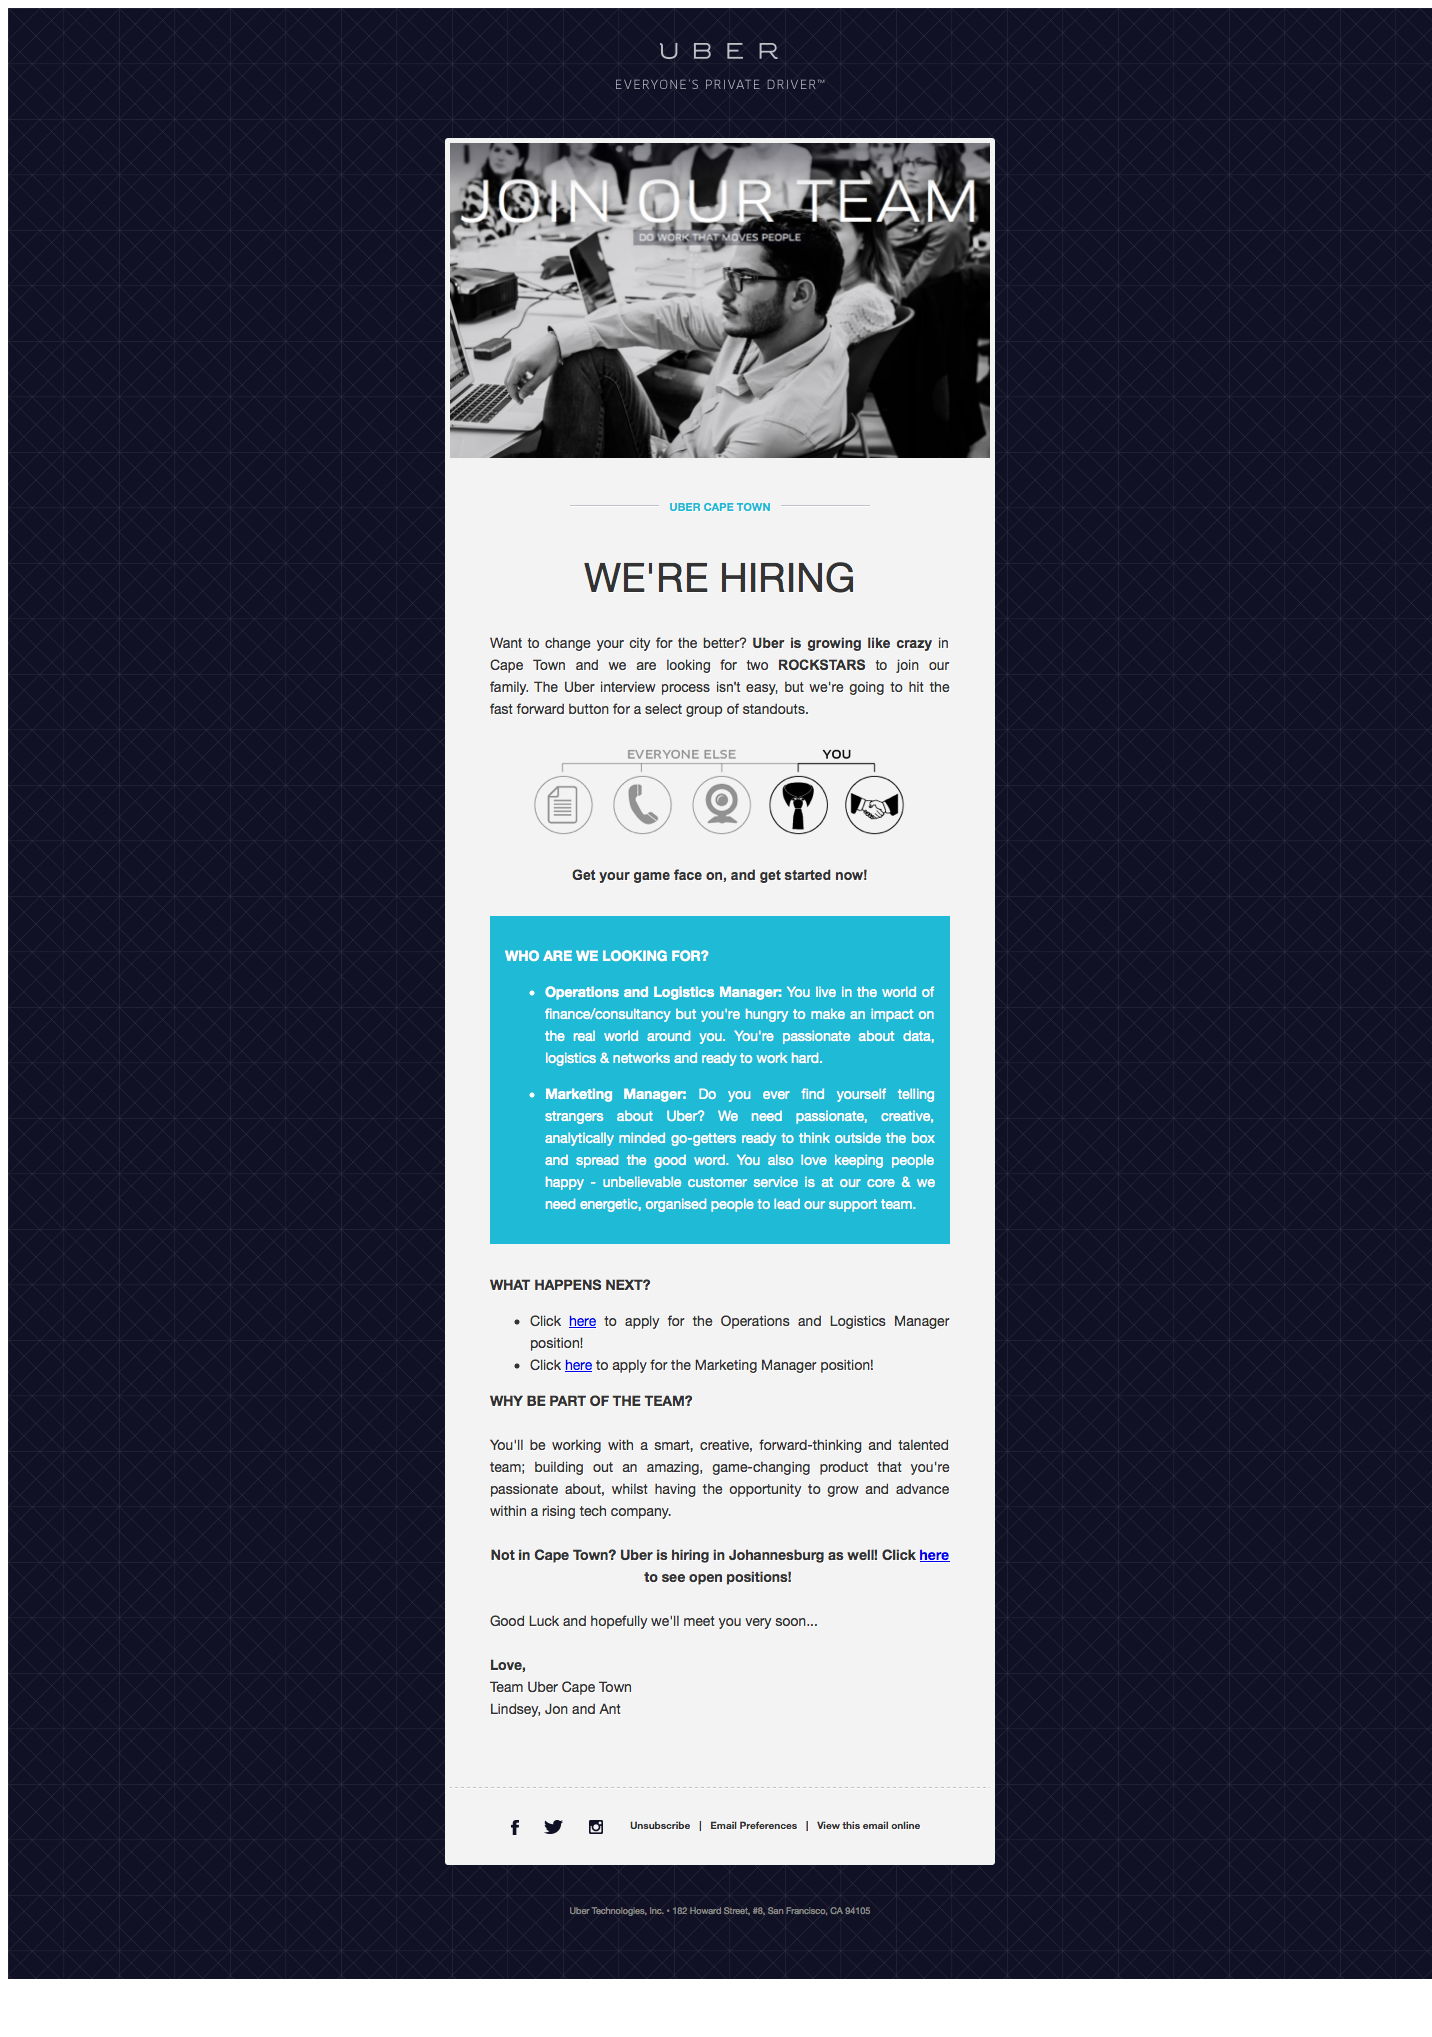 email marketing  newsletter  job offer email   uber